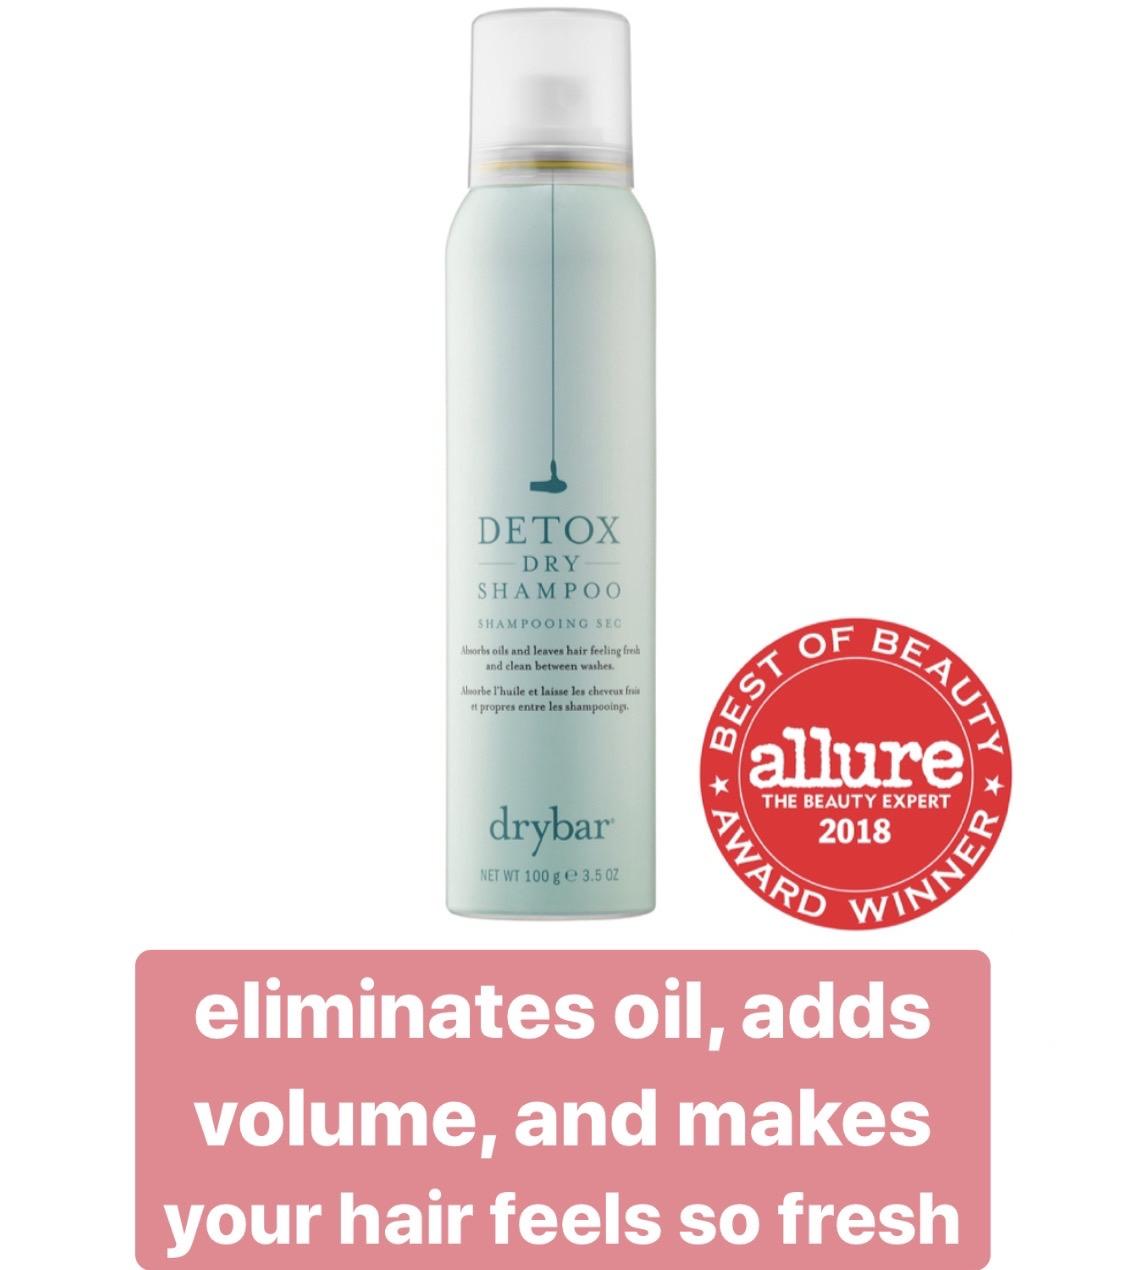 Sephora Sale - Dry Bar Dry Shampoo